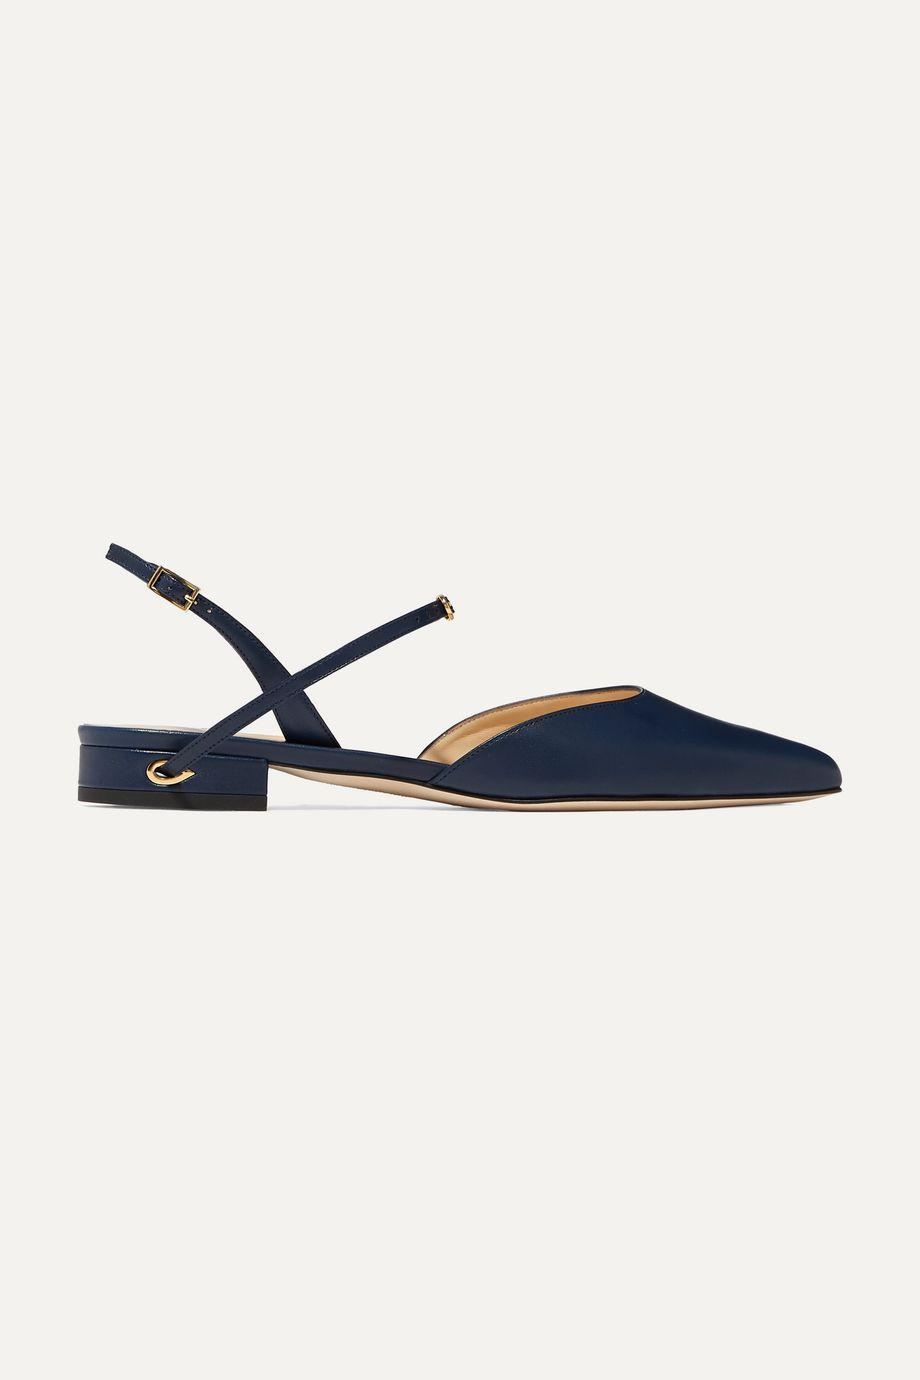 Jennifer Chamandi Vittorio leather slingback point-toe flats